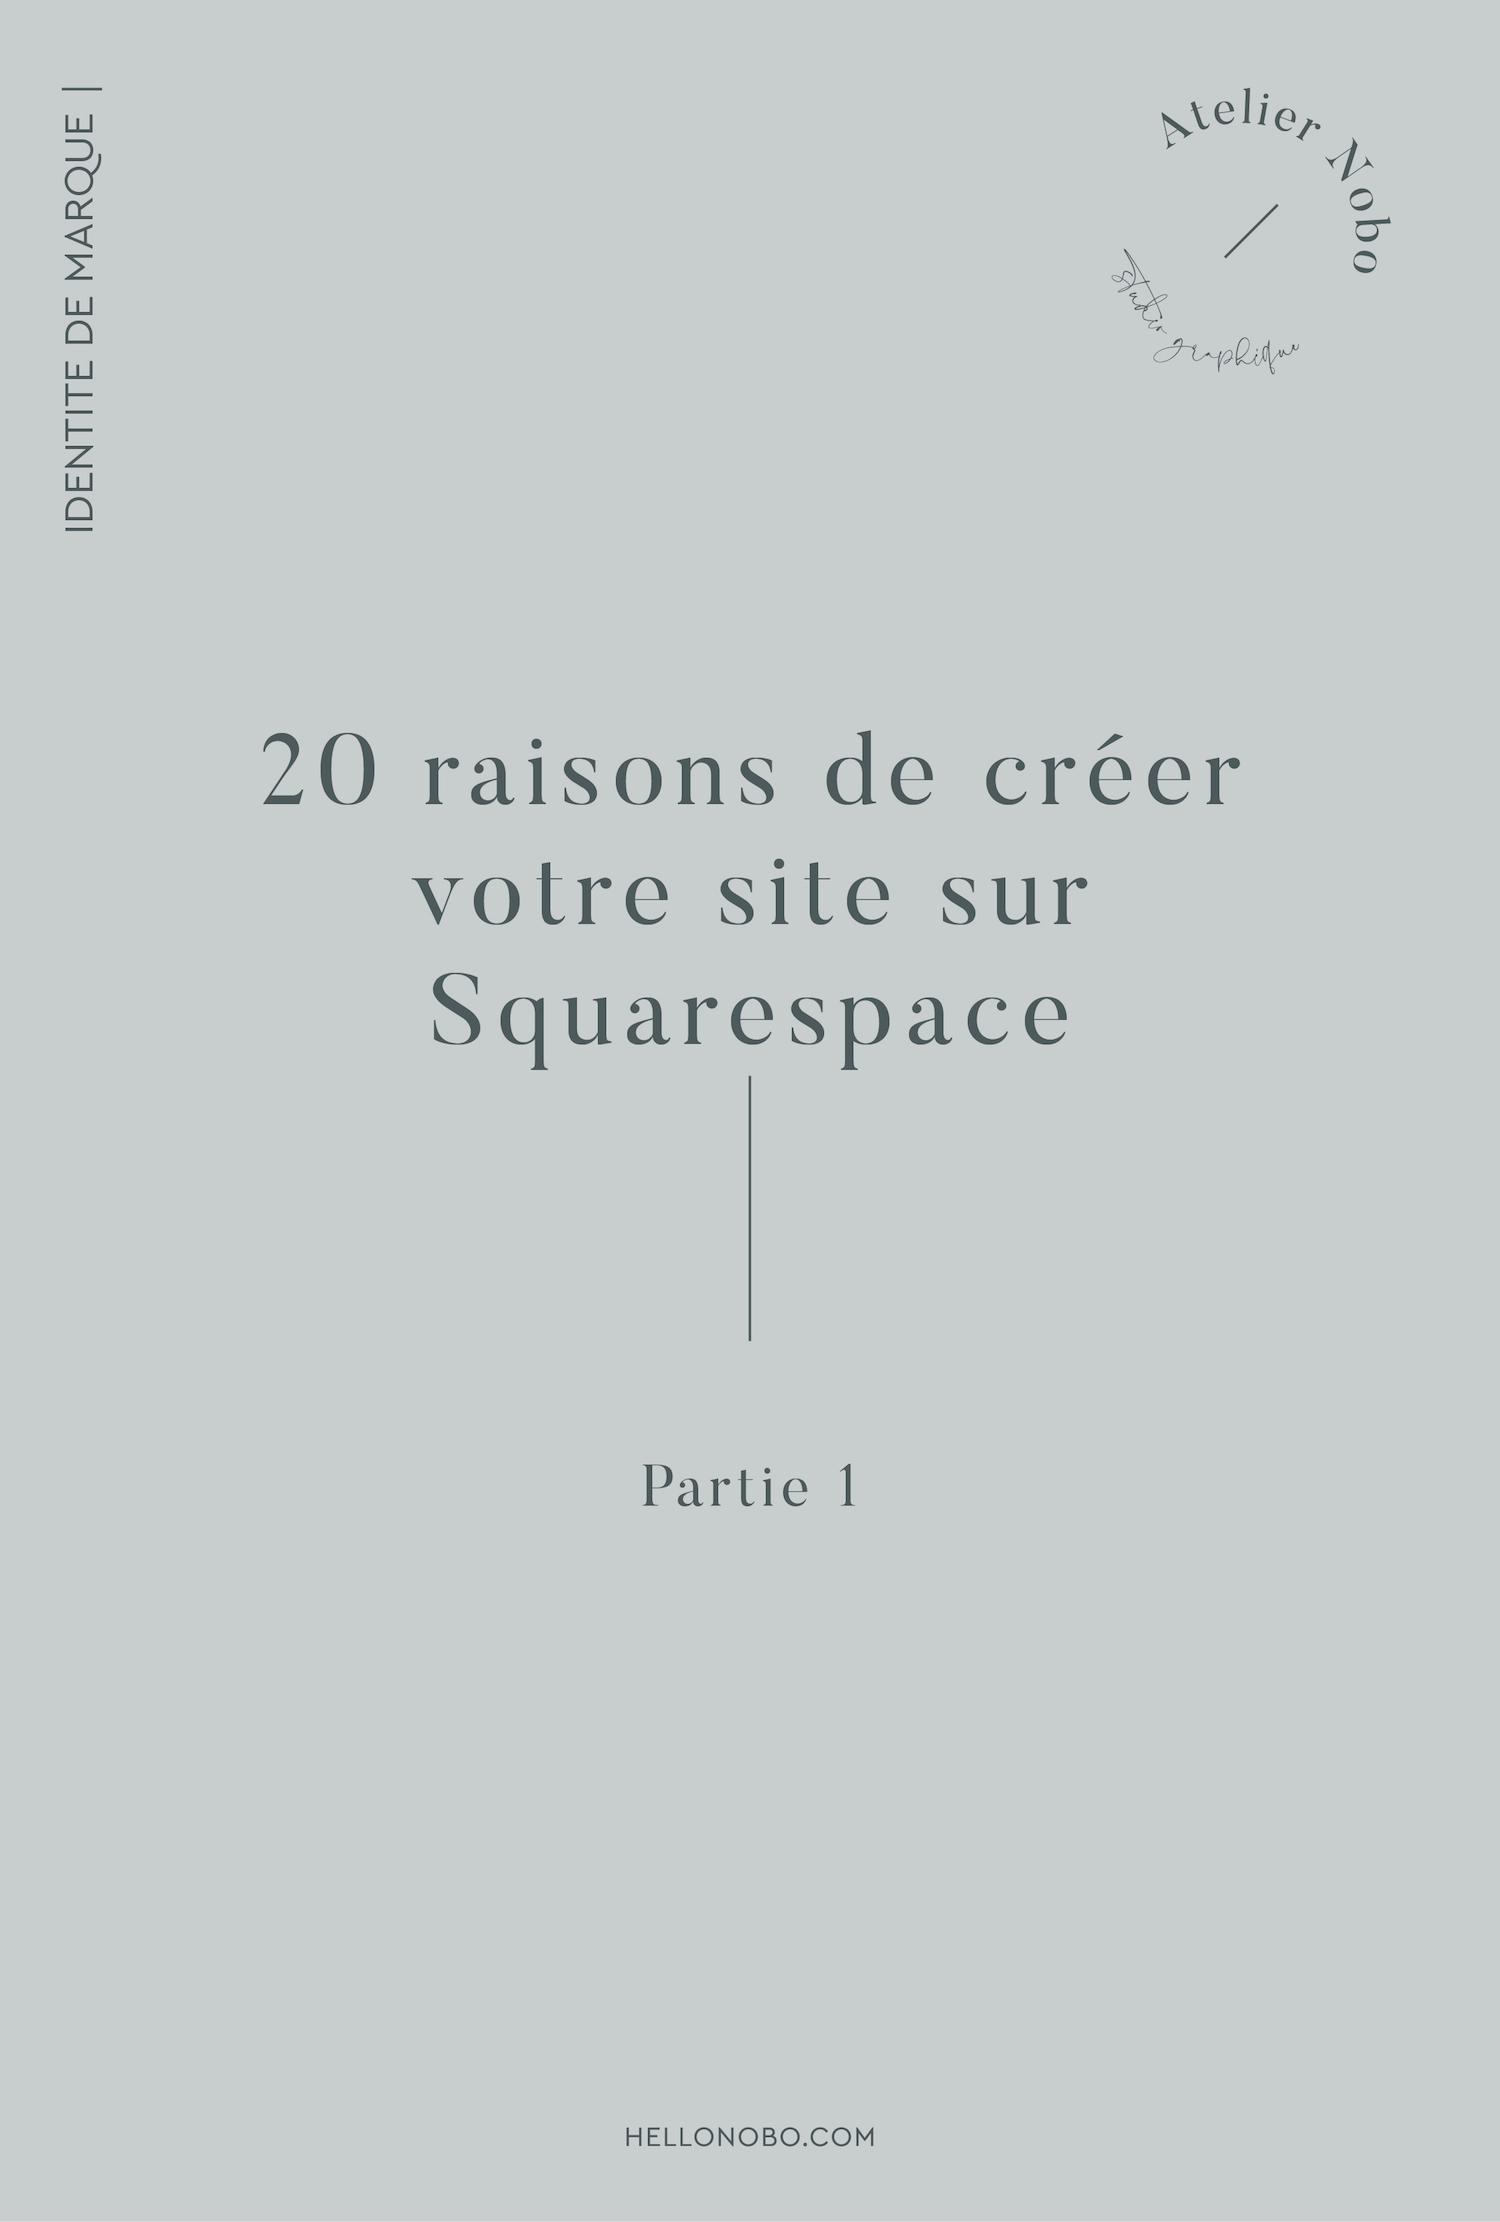 visuels blog 2017_10-9 squarespace 1.jpg